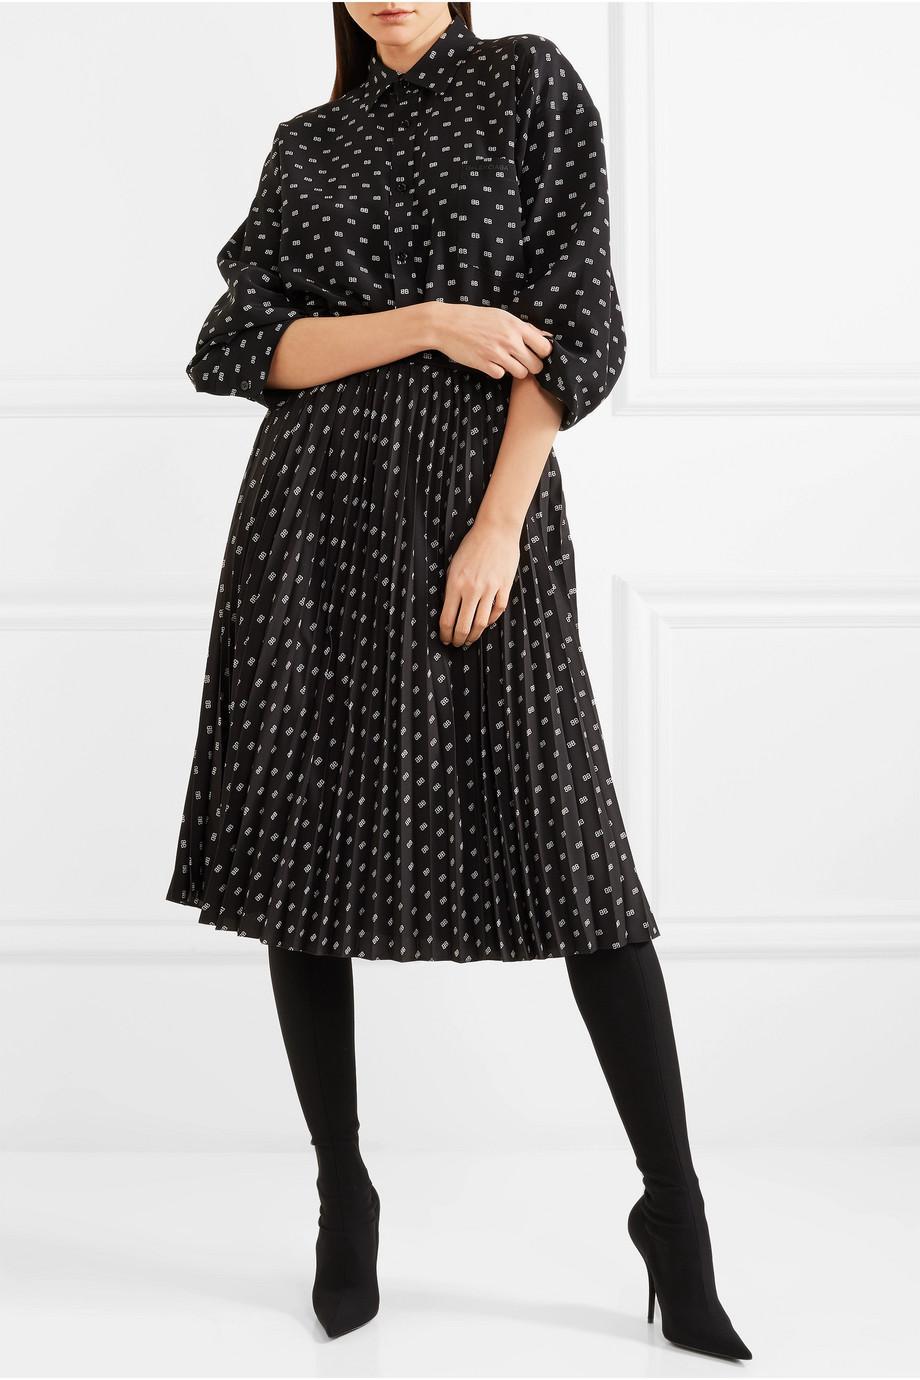 2177fc617a20 balenciaga-black-Sunray-Pleated-Printed-Satin-Skirt.jpeg